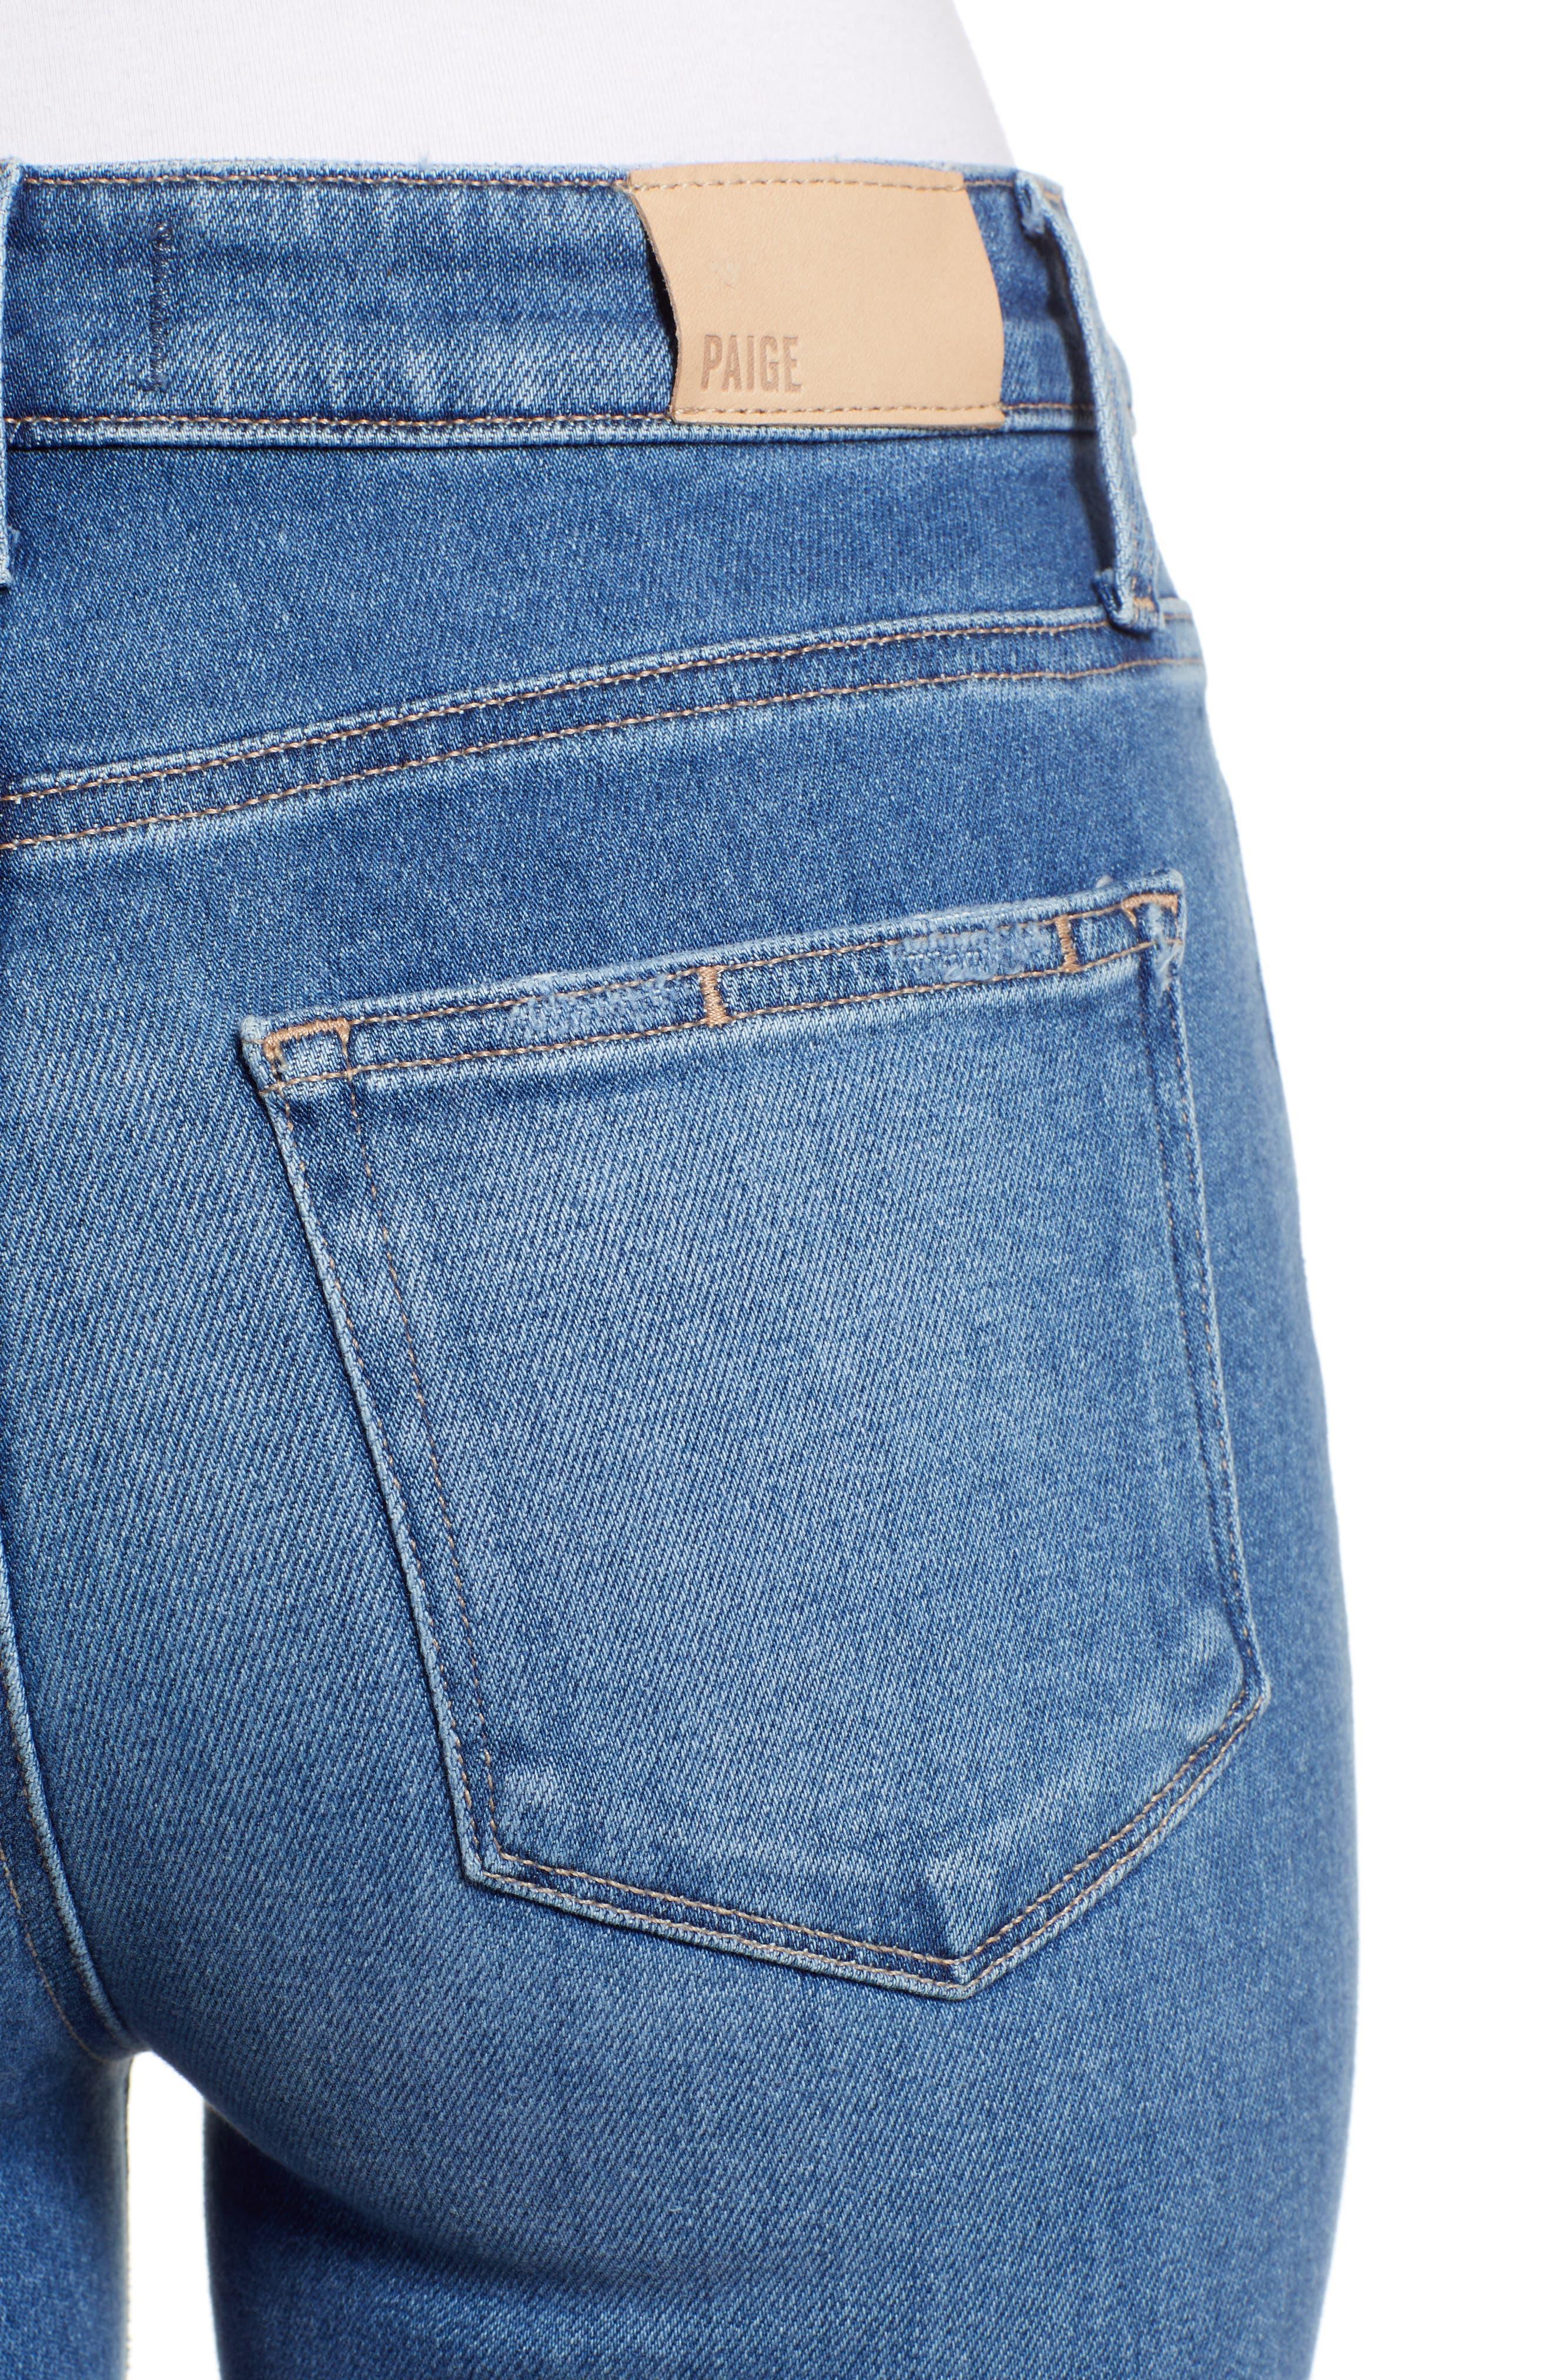 Vintage - Hoxton High Waist Raw Hem Straight Leg Jeans,                             Alternate thumbnail 4, color,                             RENZO DISTRESSED